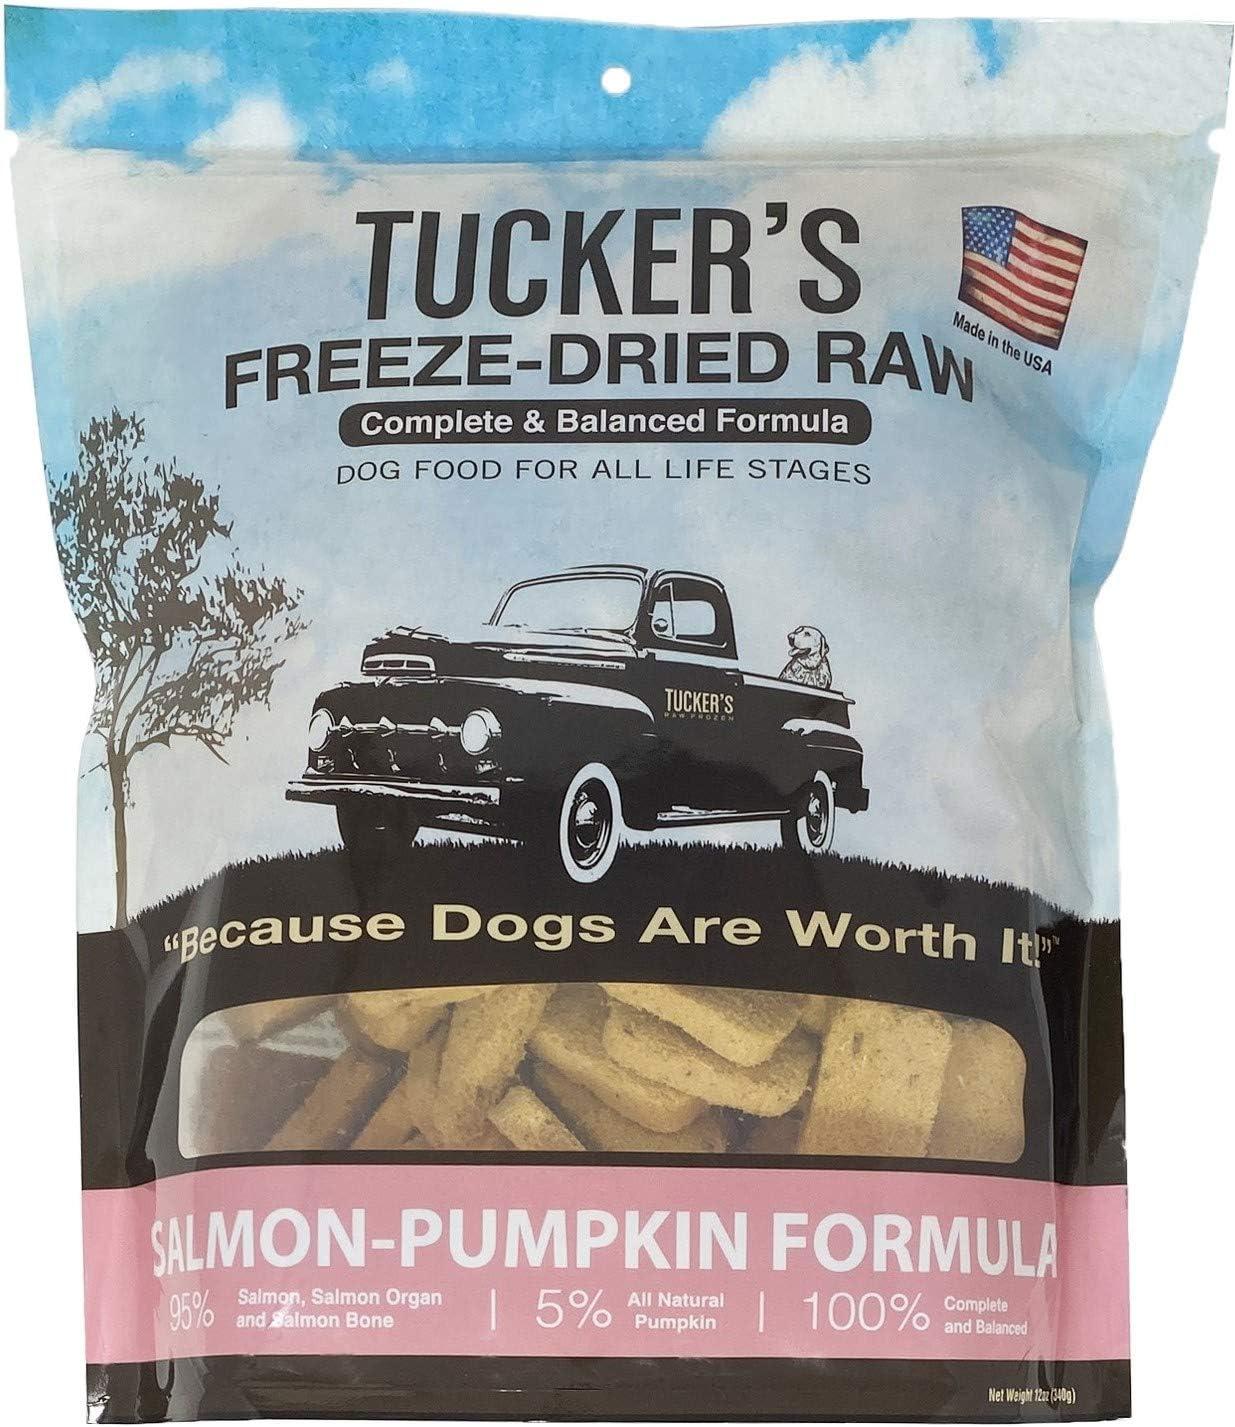 Tucker's Raw Frozen Freeze Dried Raw Dog Food, Salmon & Pumpkin Formula 12oz